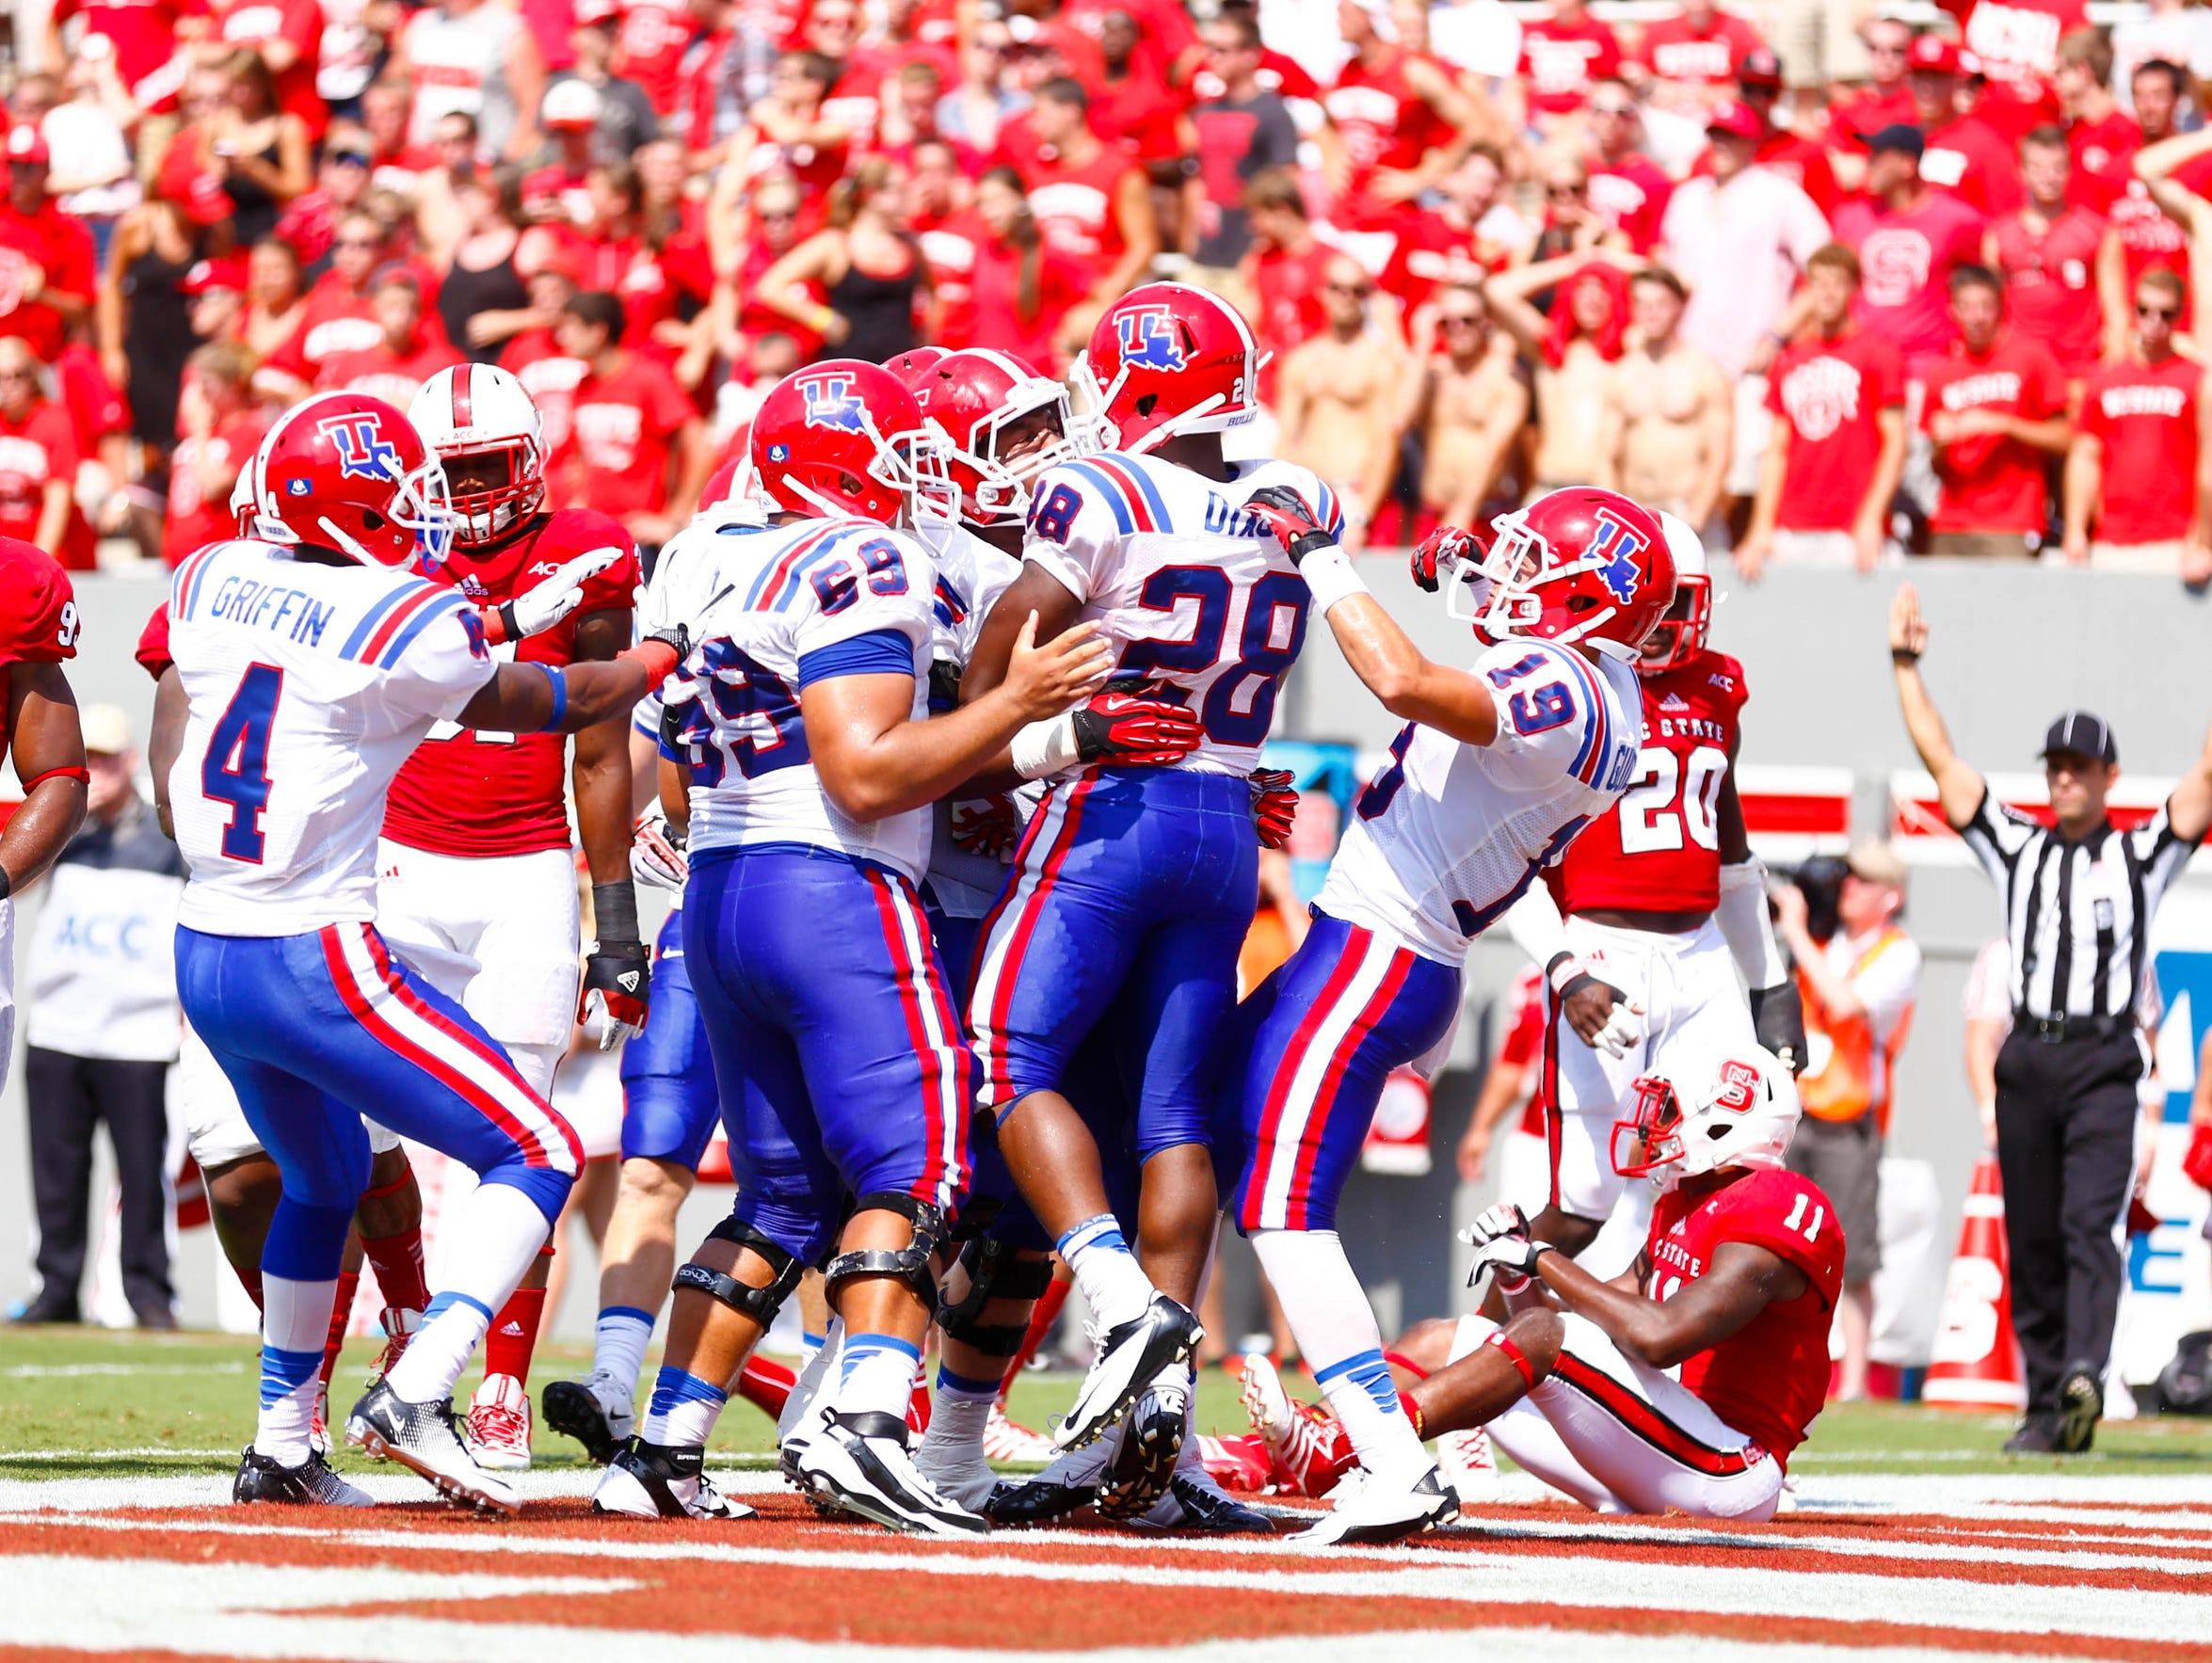 Louisiana Tech running back Kenneth Dixon (28) celebrates